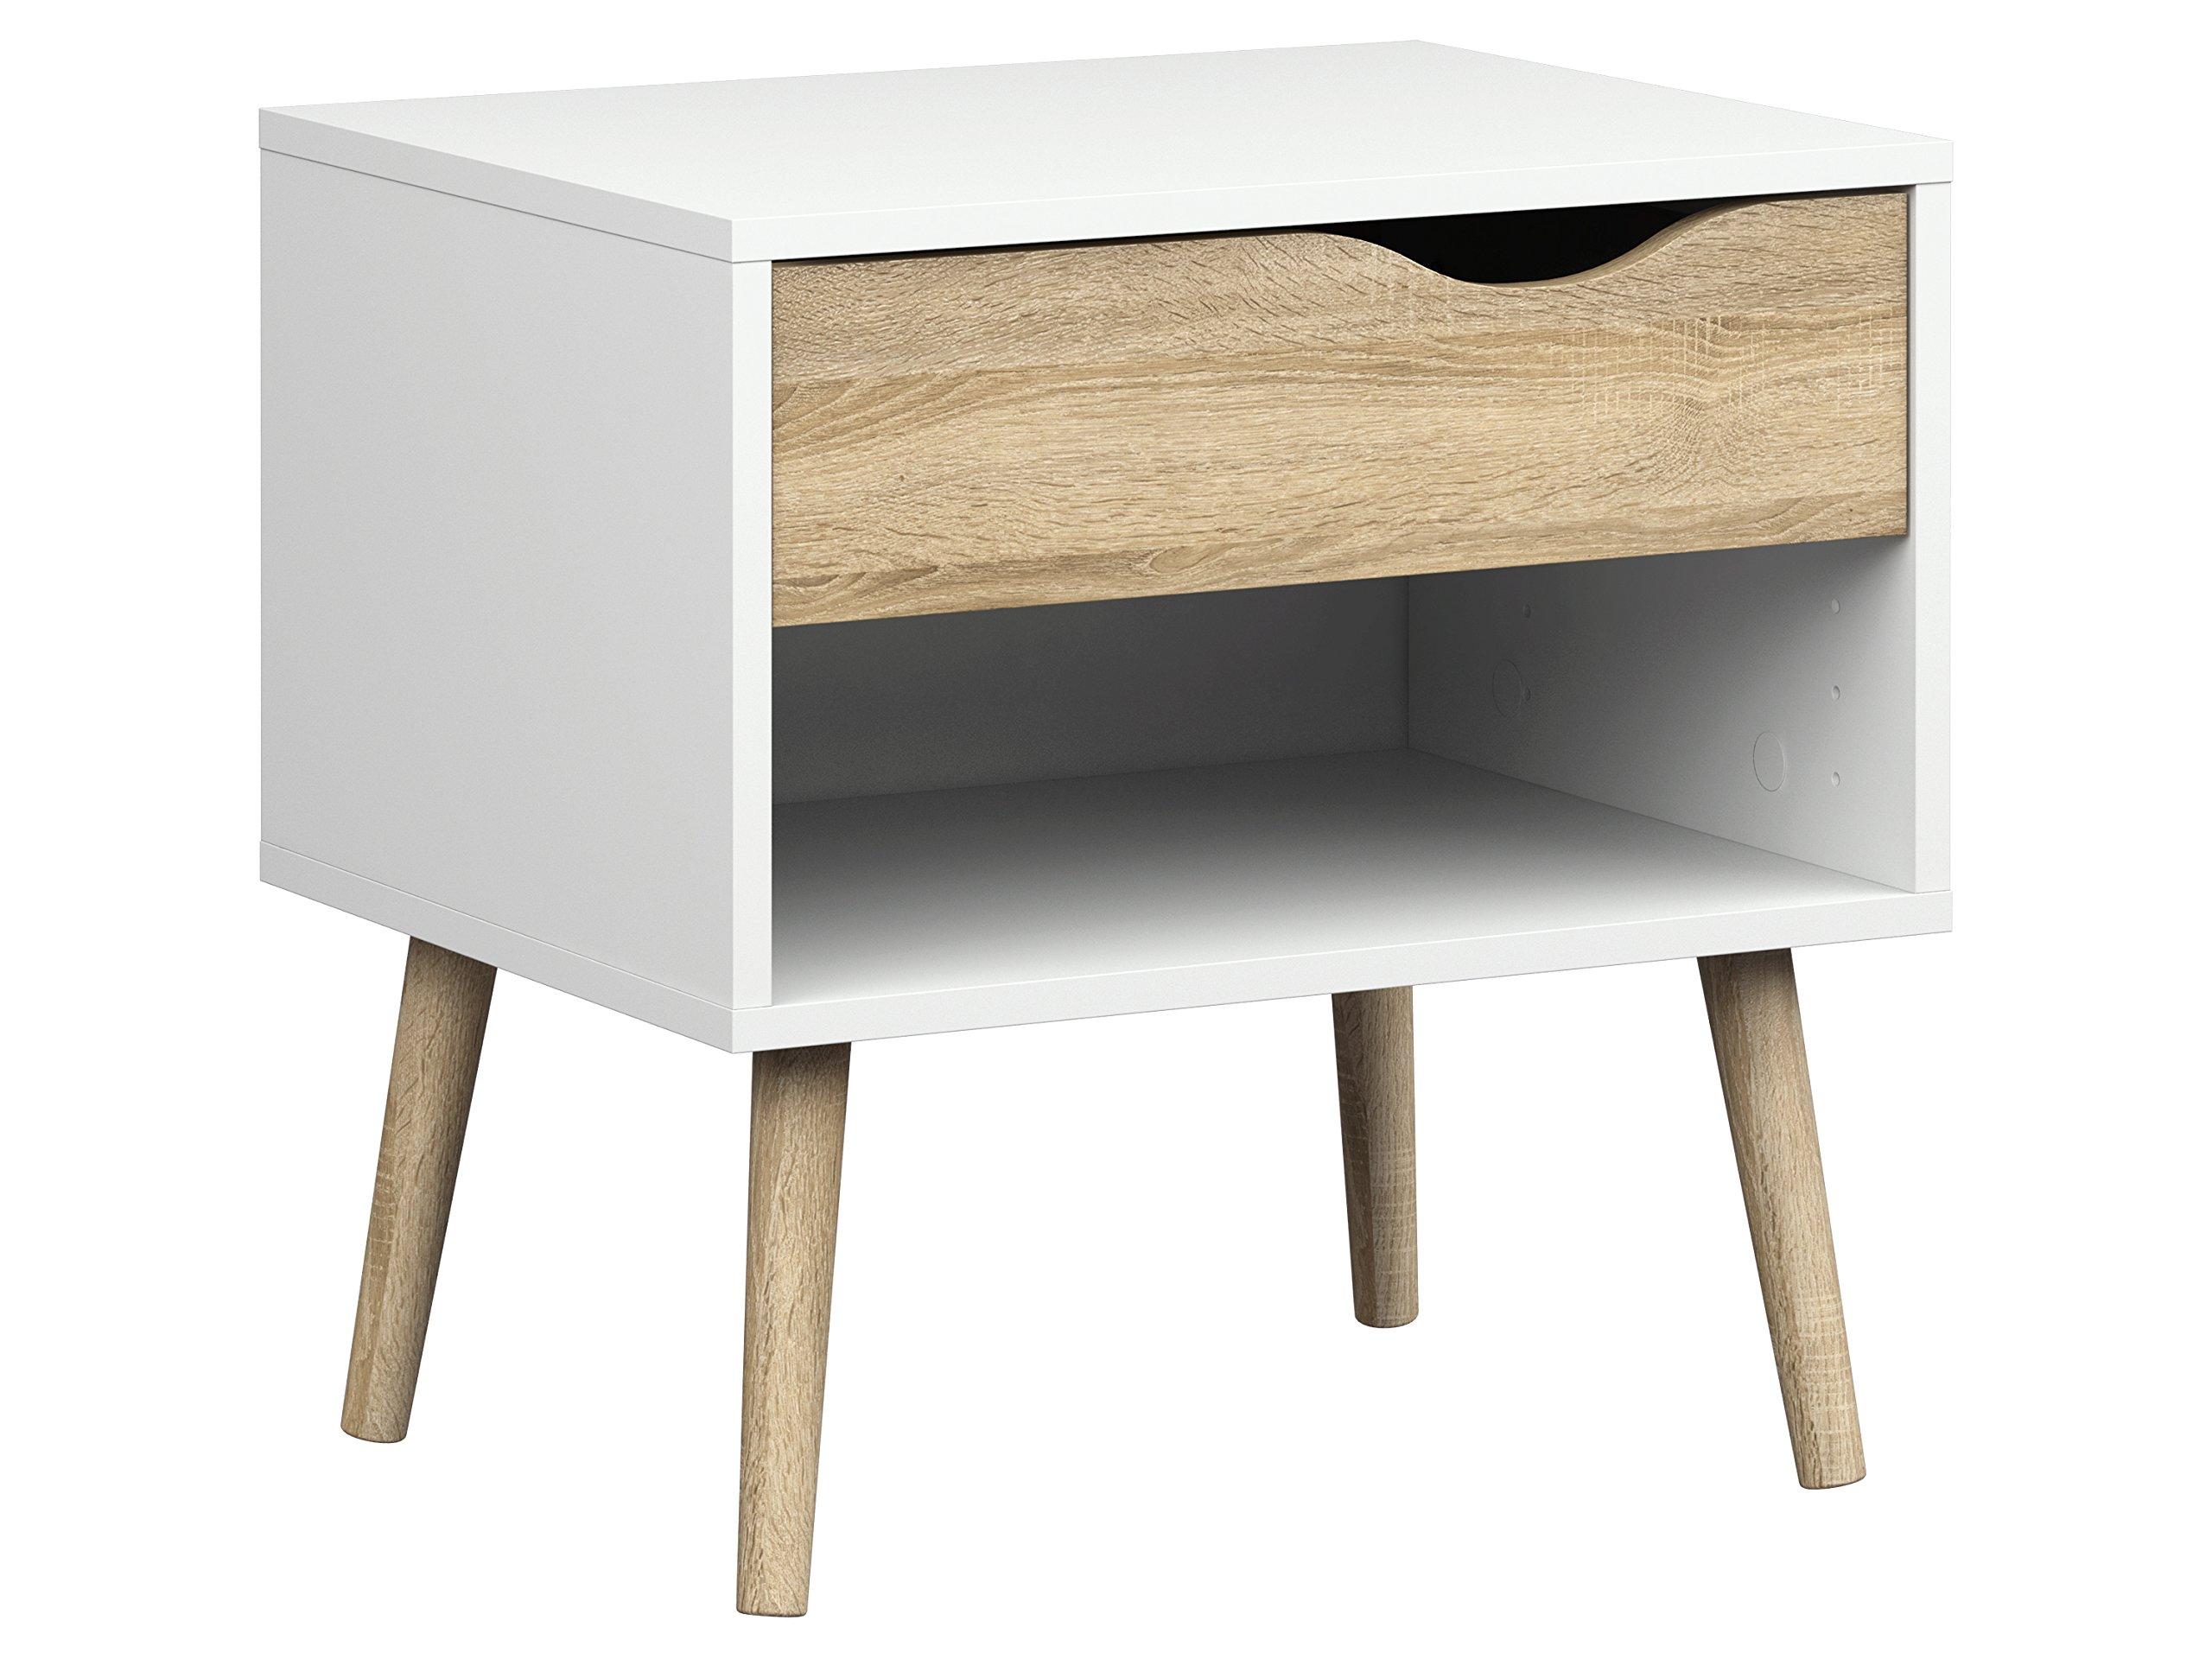 Tvilum 7539449ak Diana 1 Drawer Nightstand, White/Oak Structure by Tvilum